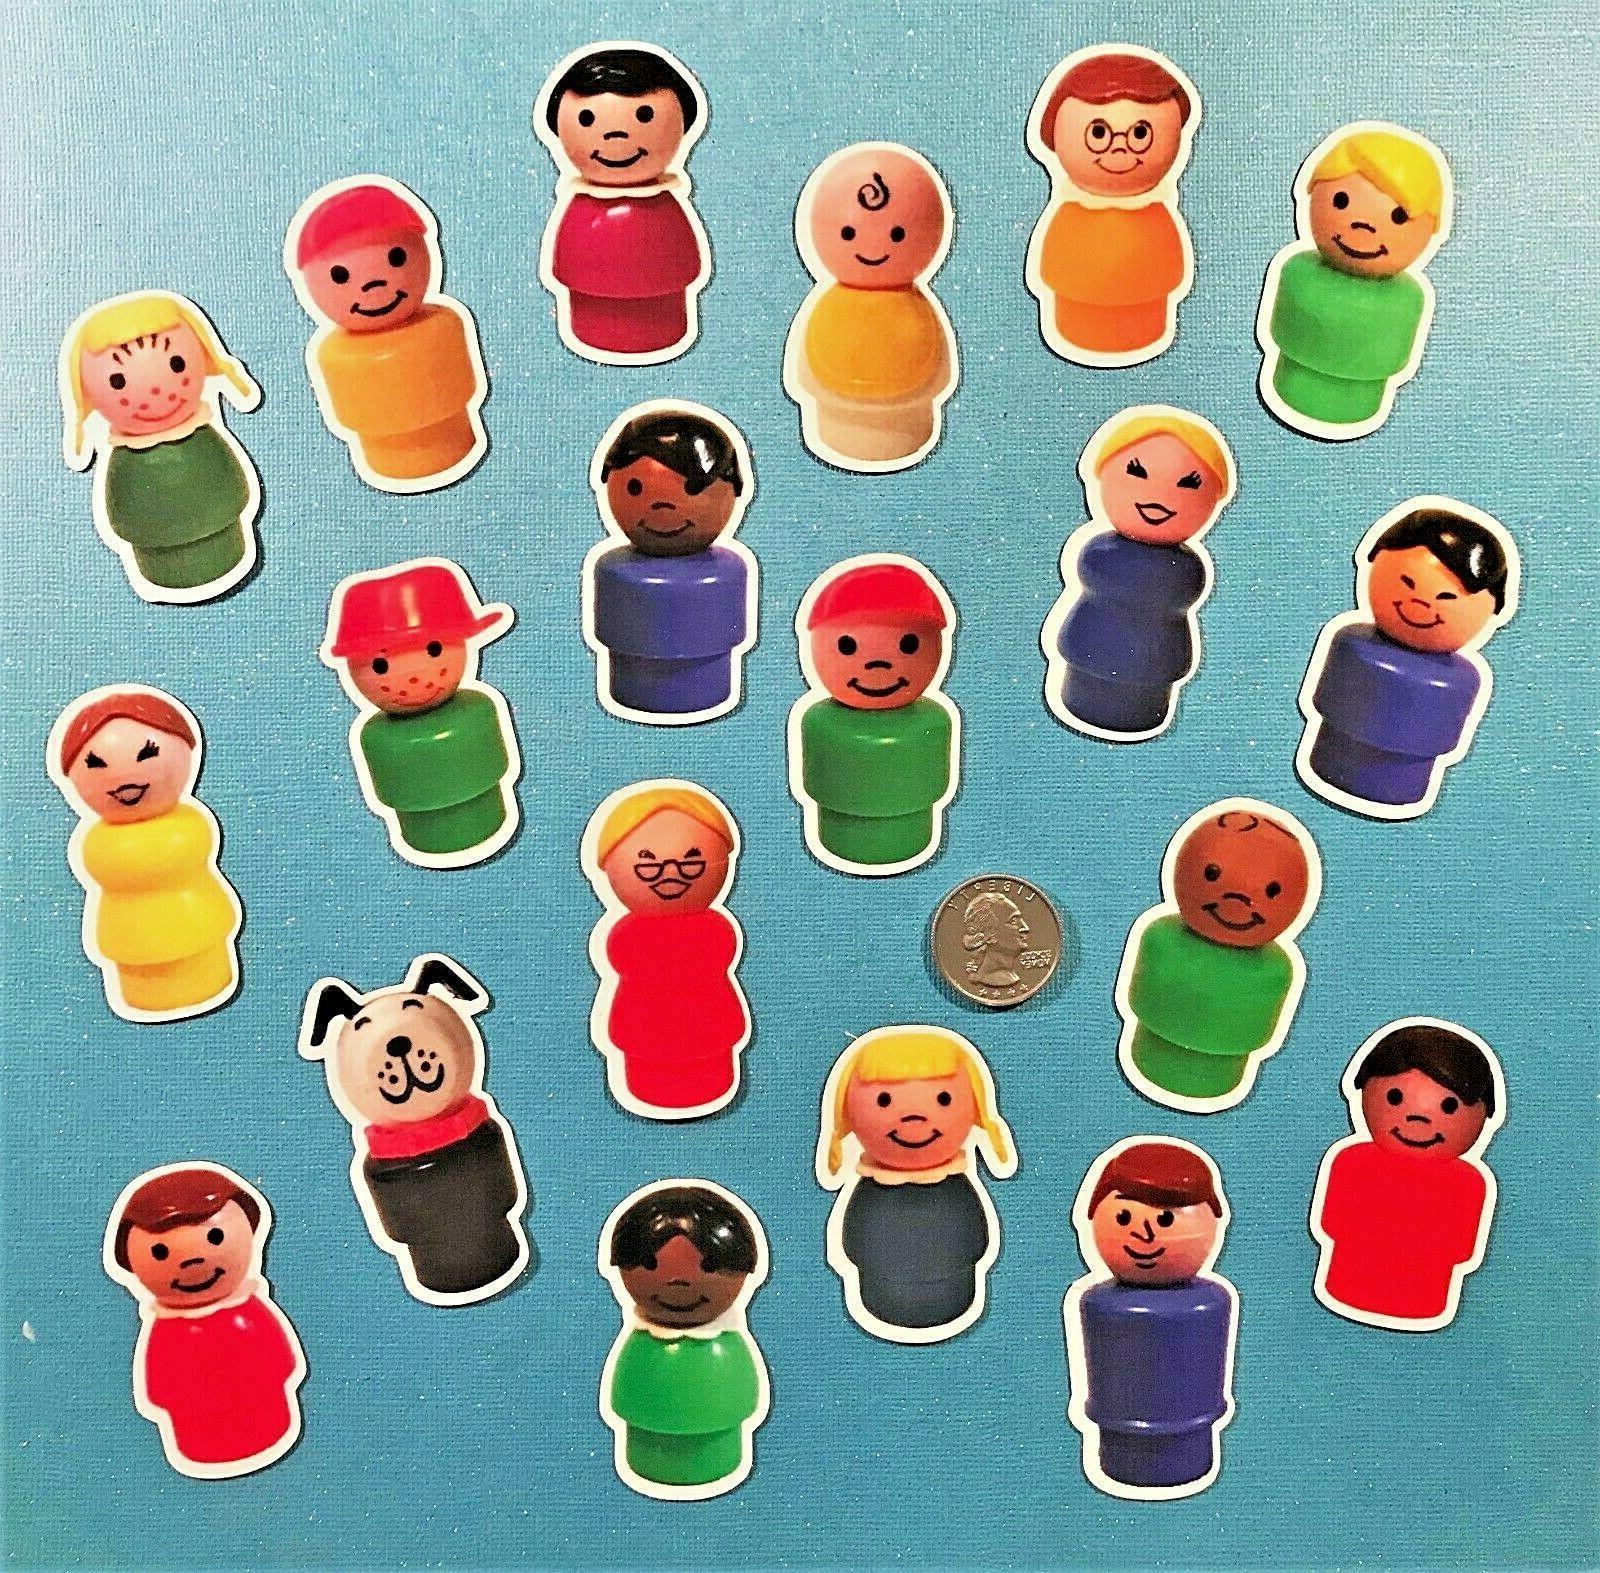 vintage little people figures magnets set fridge